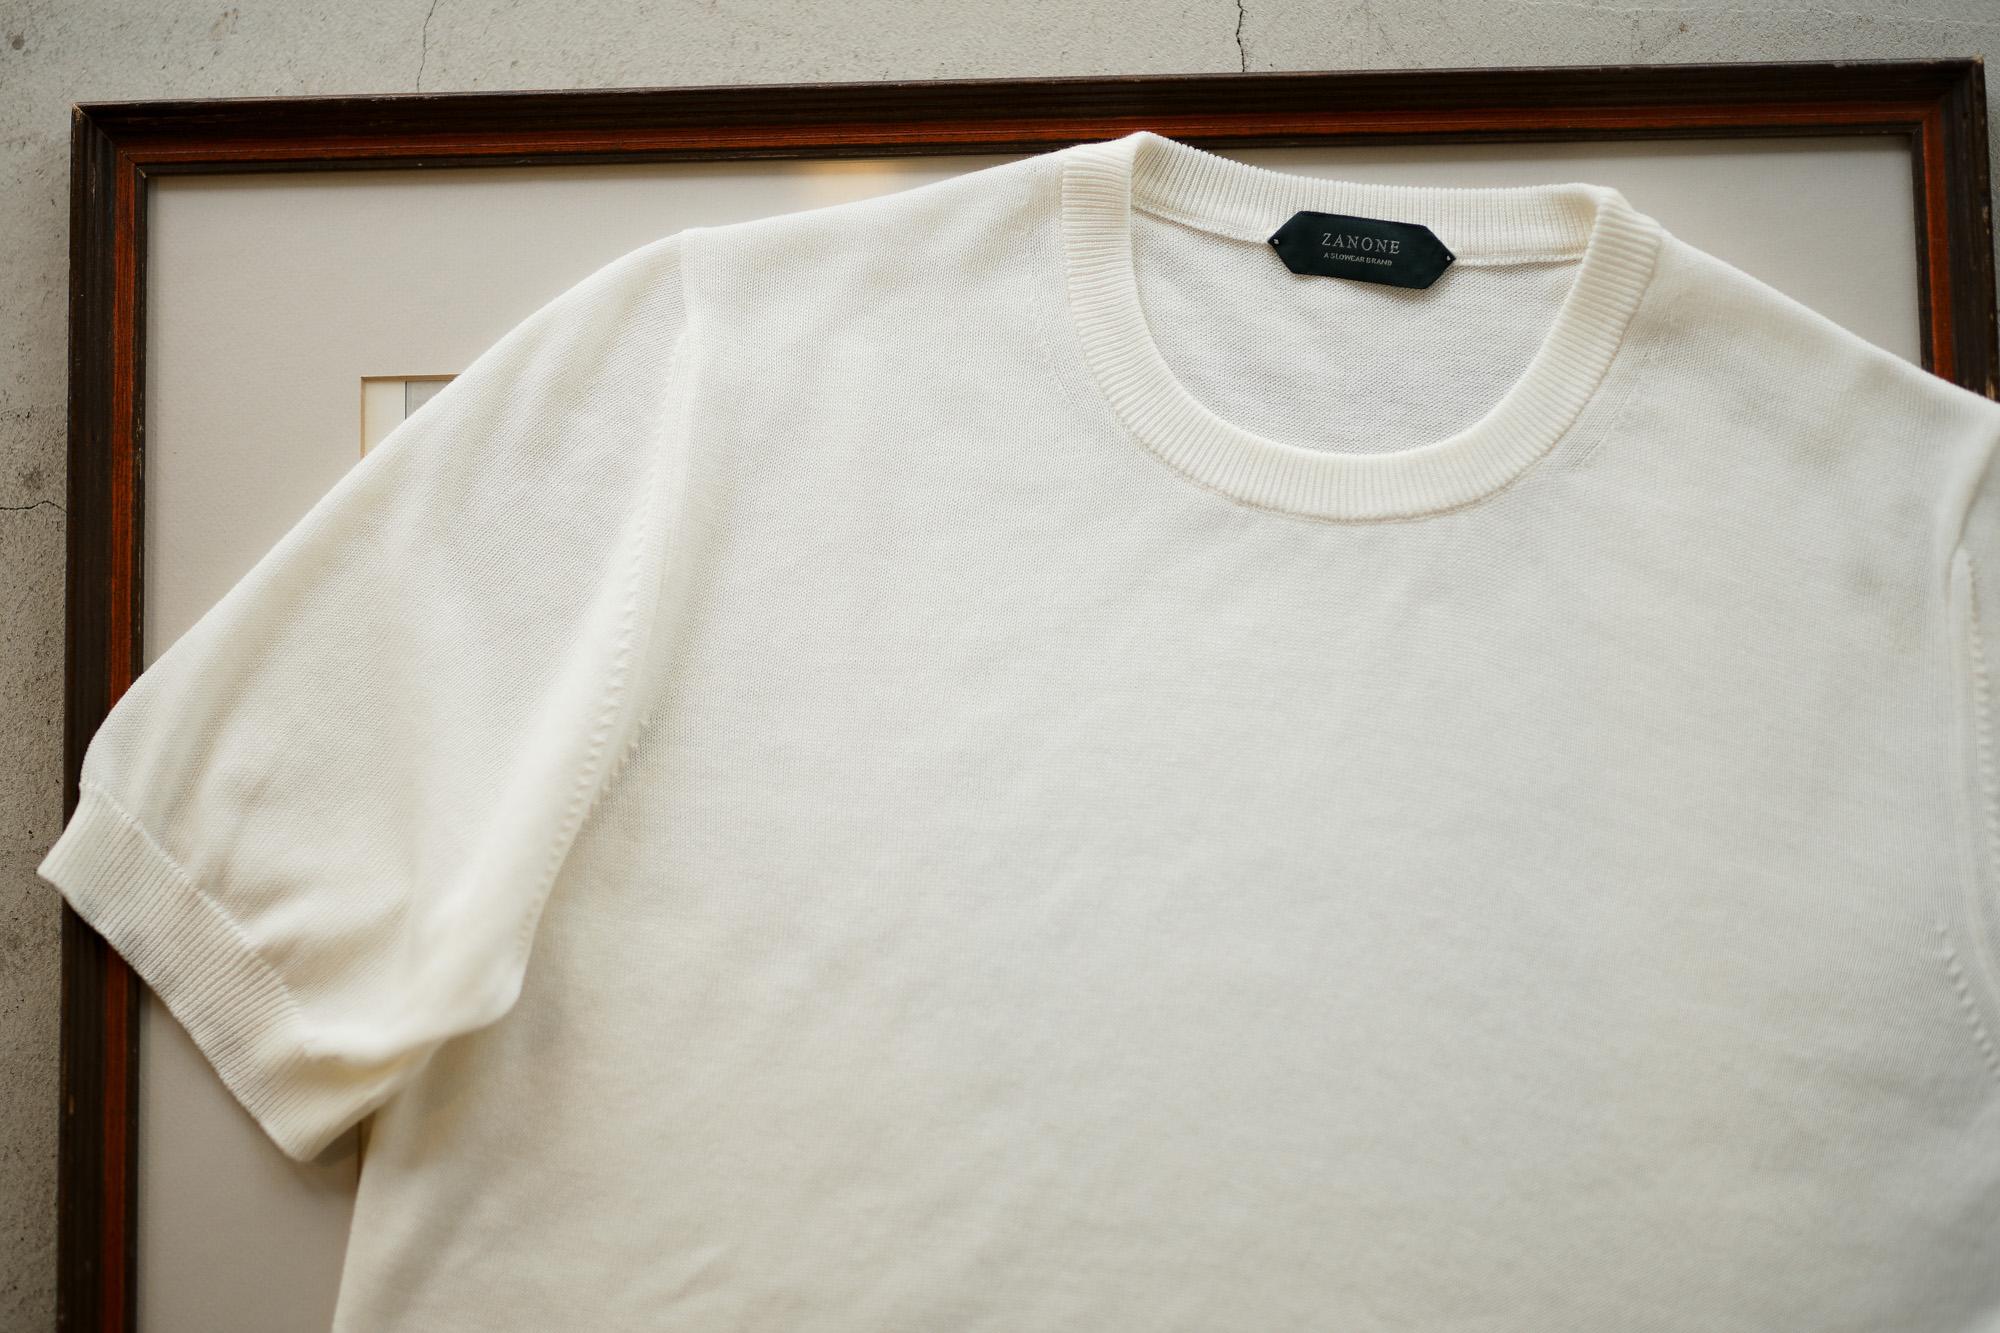 ZANONE (ザノーネ) Knit T-shirt (ニット Tシャツ) コットンニット Tシャツ WHITE (ホワイト・Z3372) made in italy (イタリア製) 2019 春夏新作 愛知 名古屋 altoediritto アルトエデリット